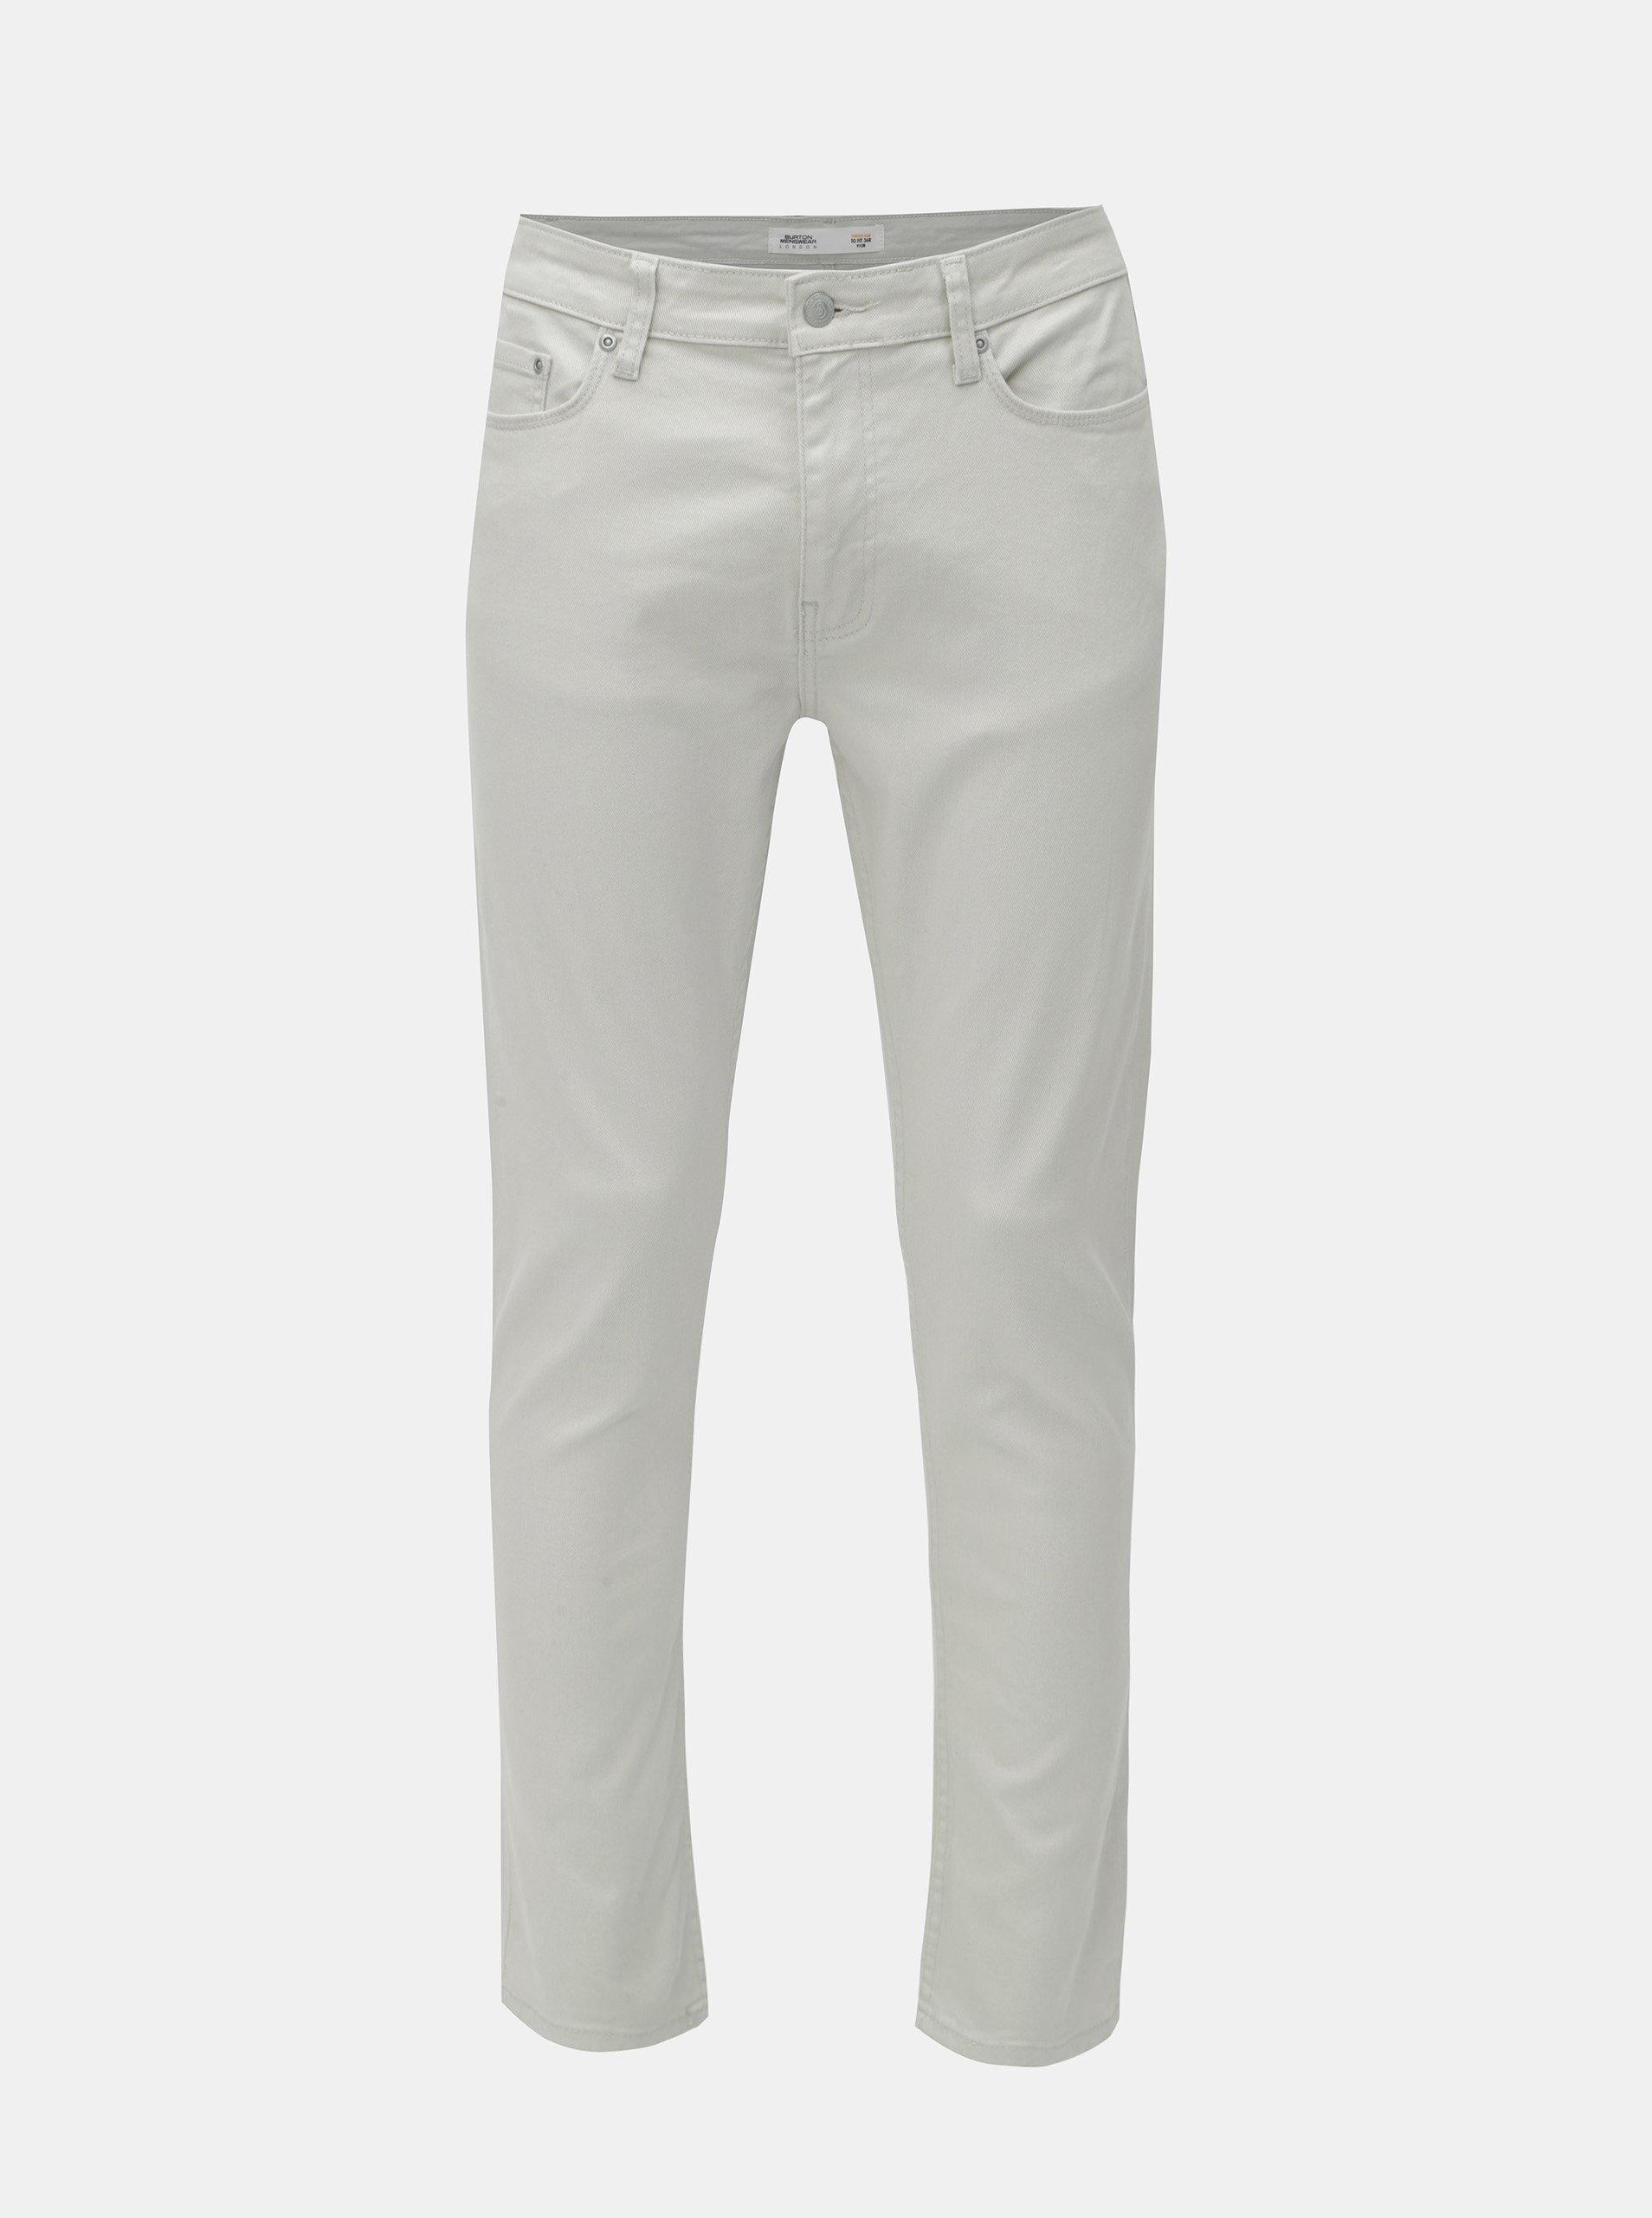 Béžové slim fit džíny Burton Menswear London